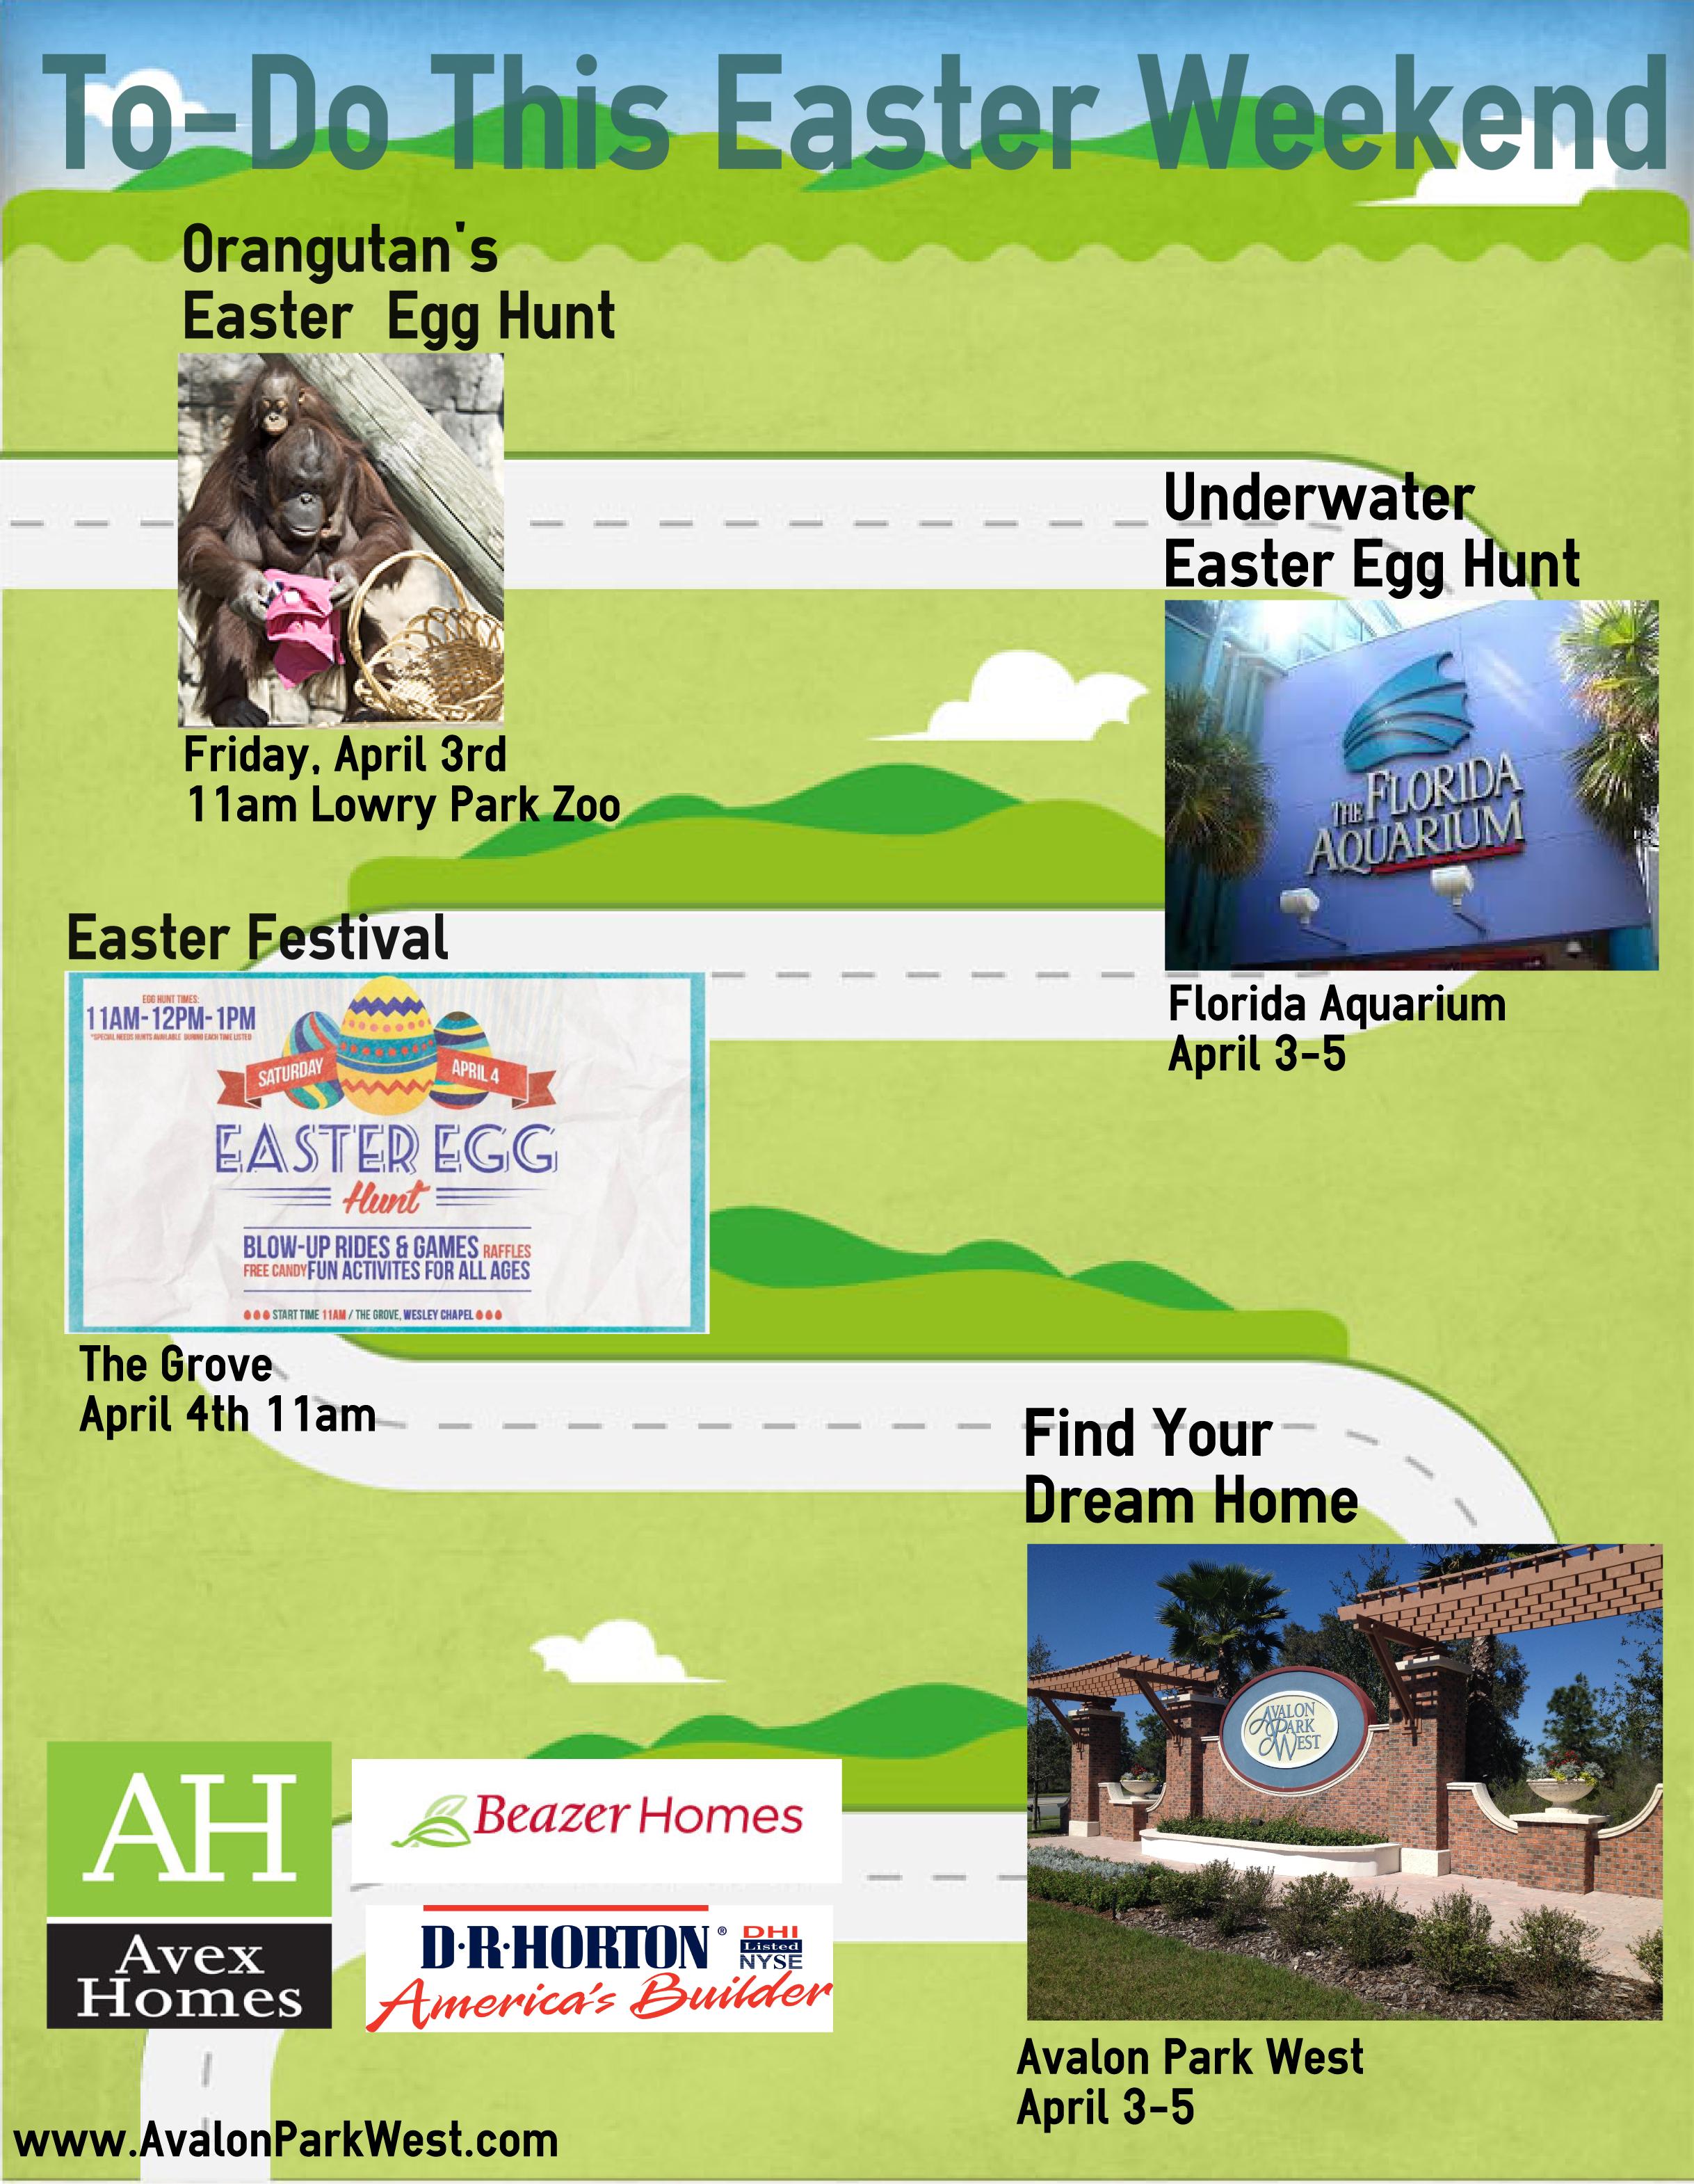 Easter weekend activity flyer